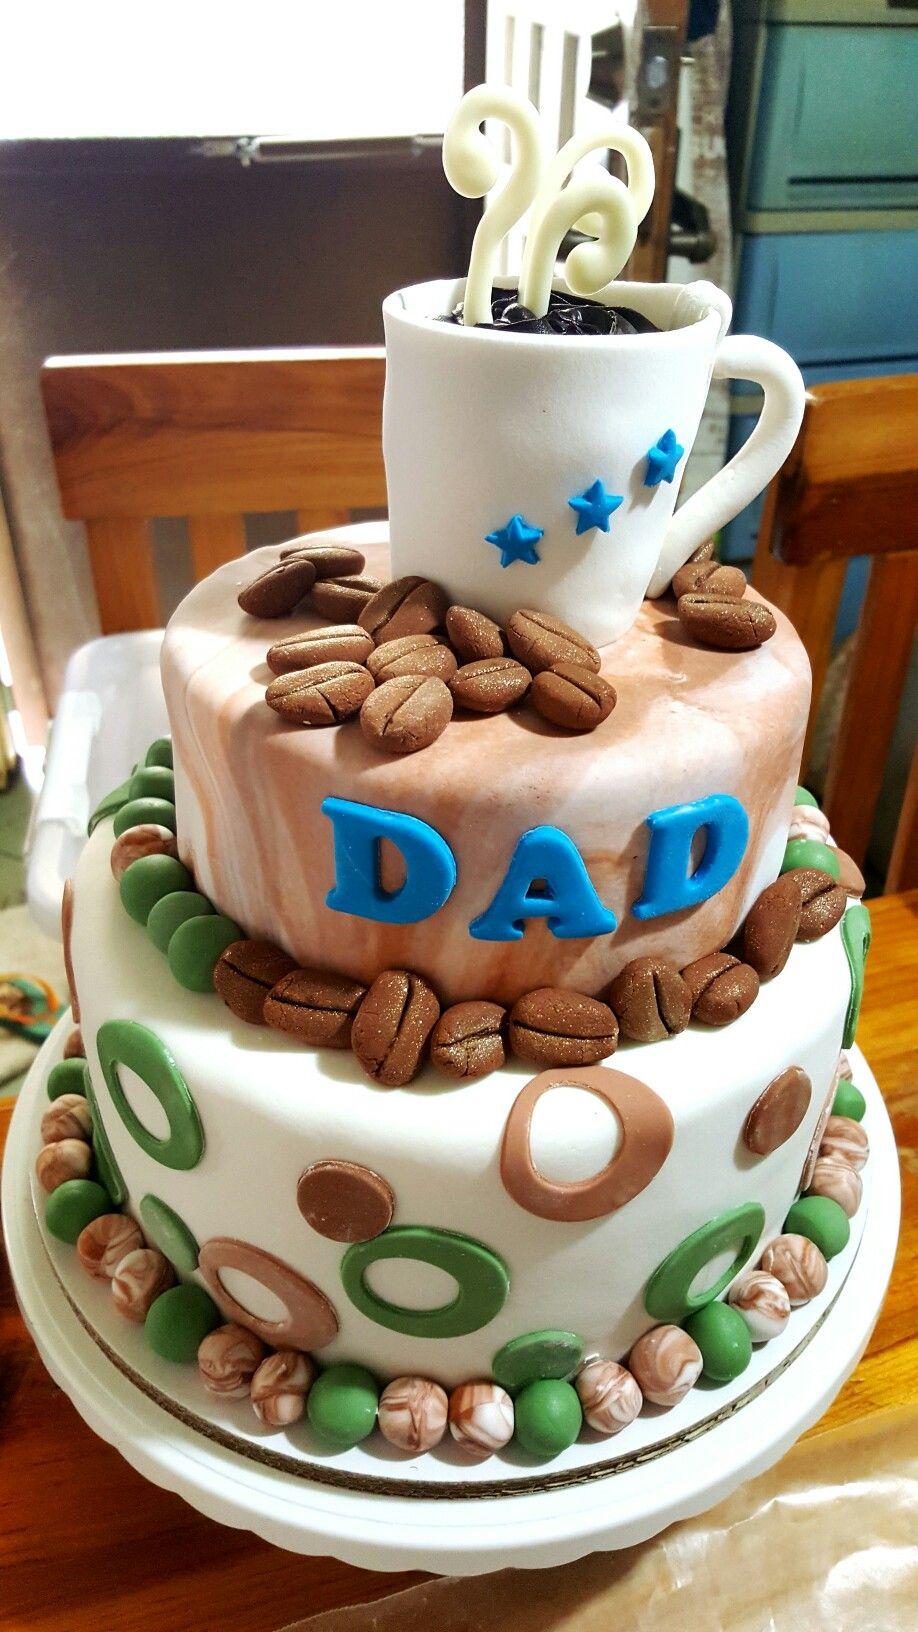 Birthday cake for dad Dad birthday cakes, Cake, Food